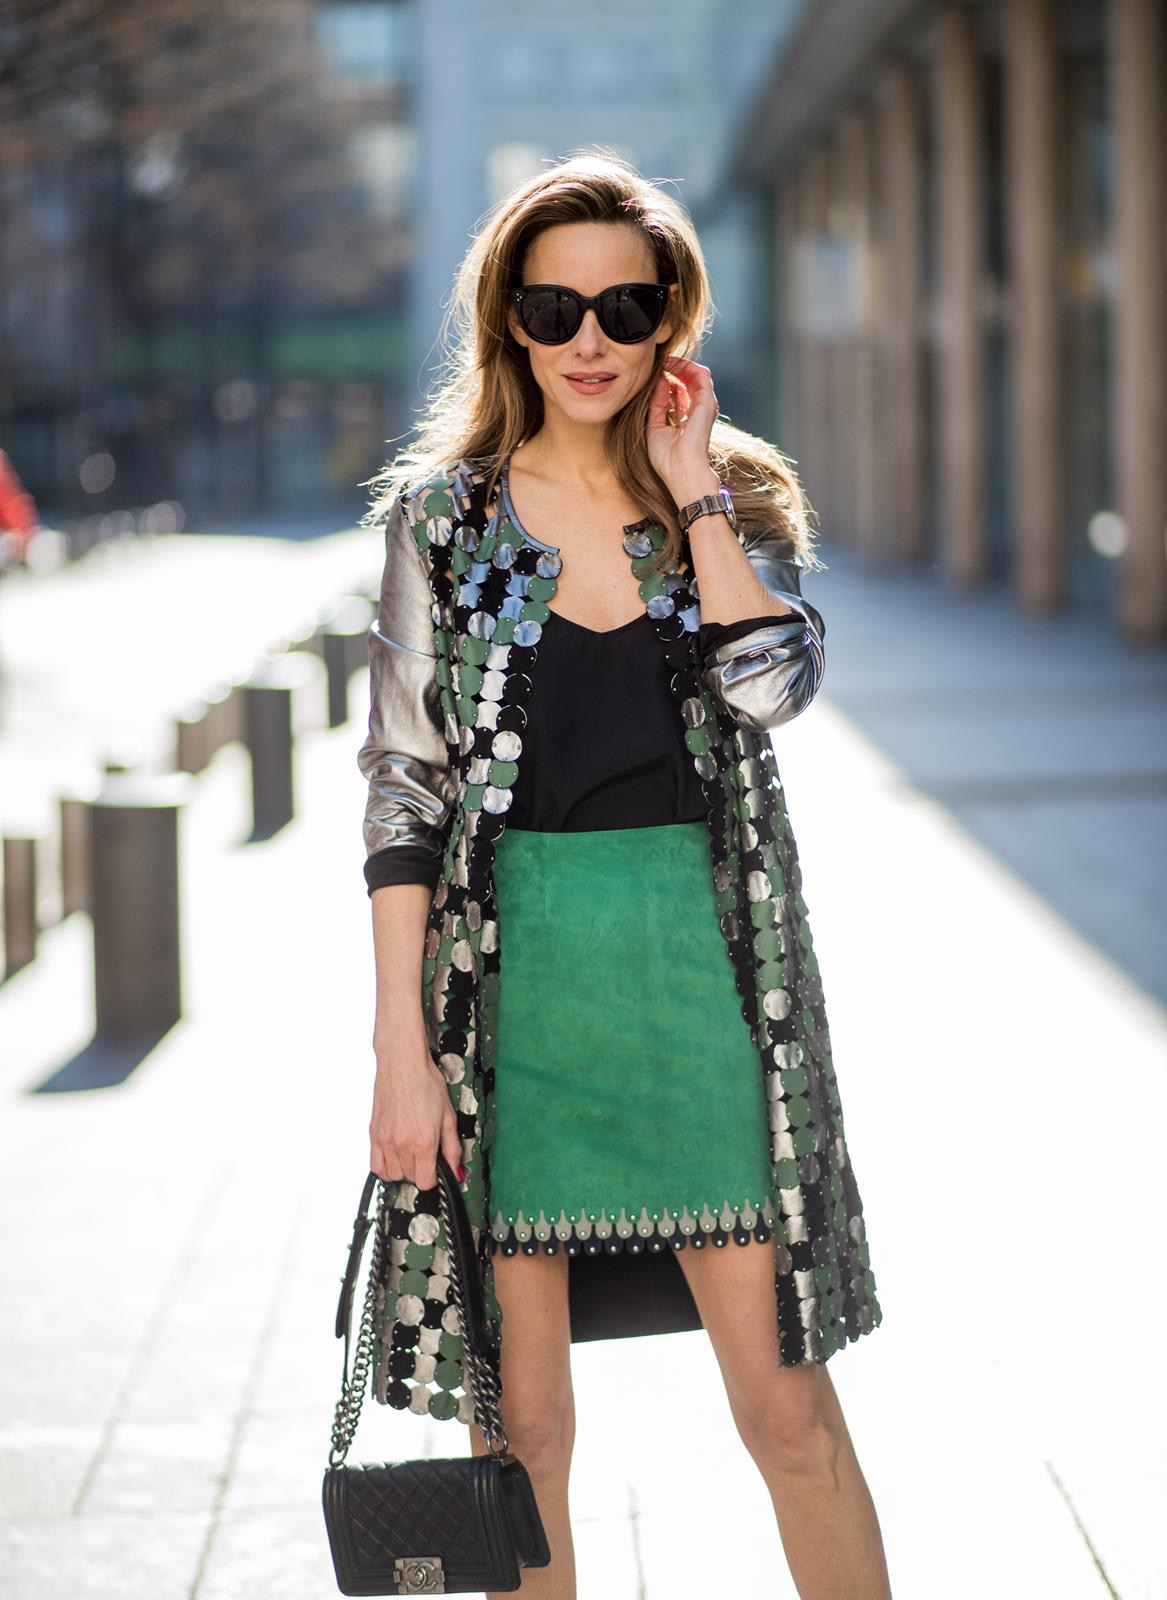 Silver Coat Suede Skirt Blog Alexandra Lapp